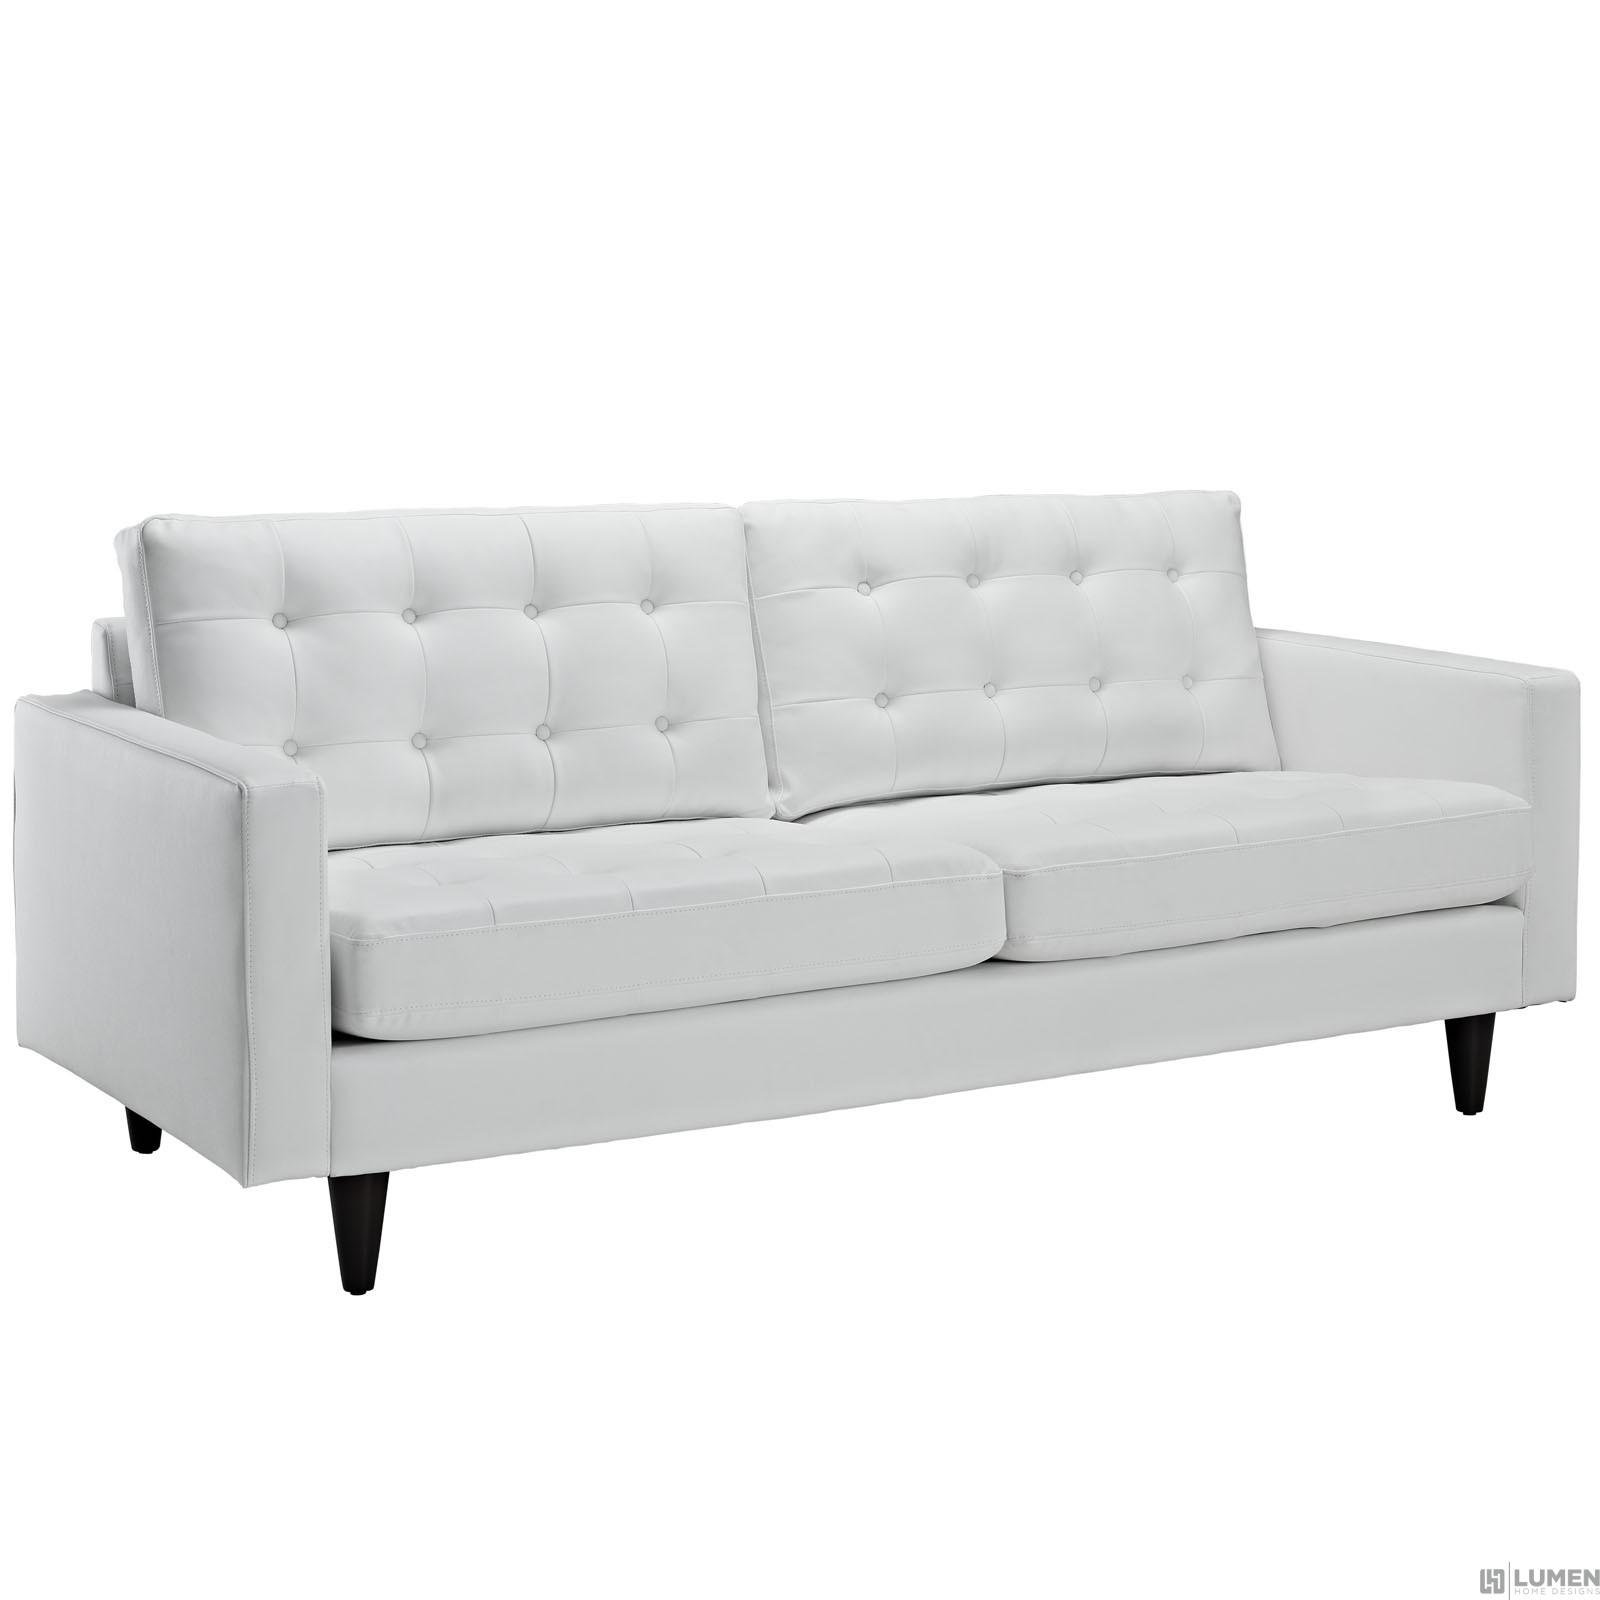 LHD-1010-WHI-Sofa